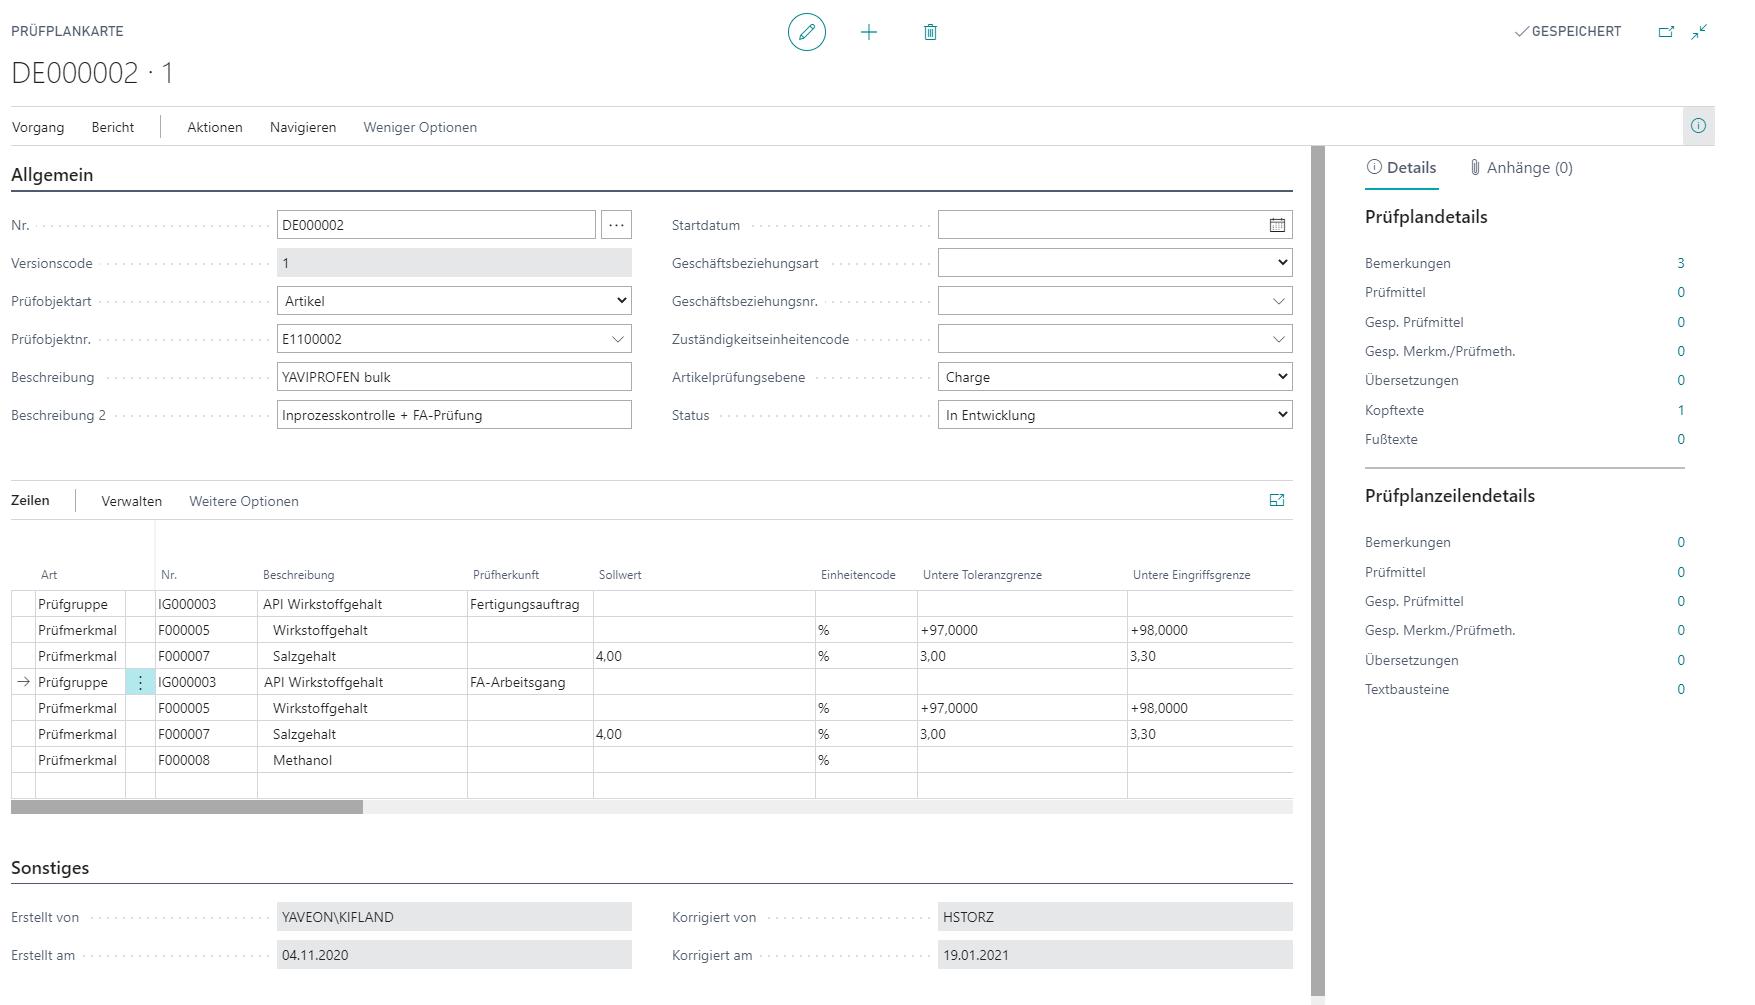 Detailscreenshot Funktion Qualitätskontrolle Pharma